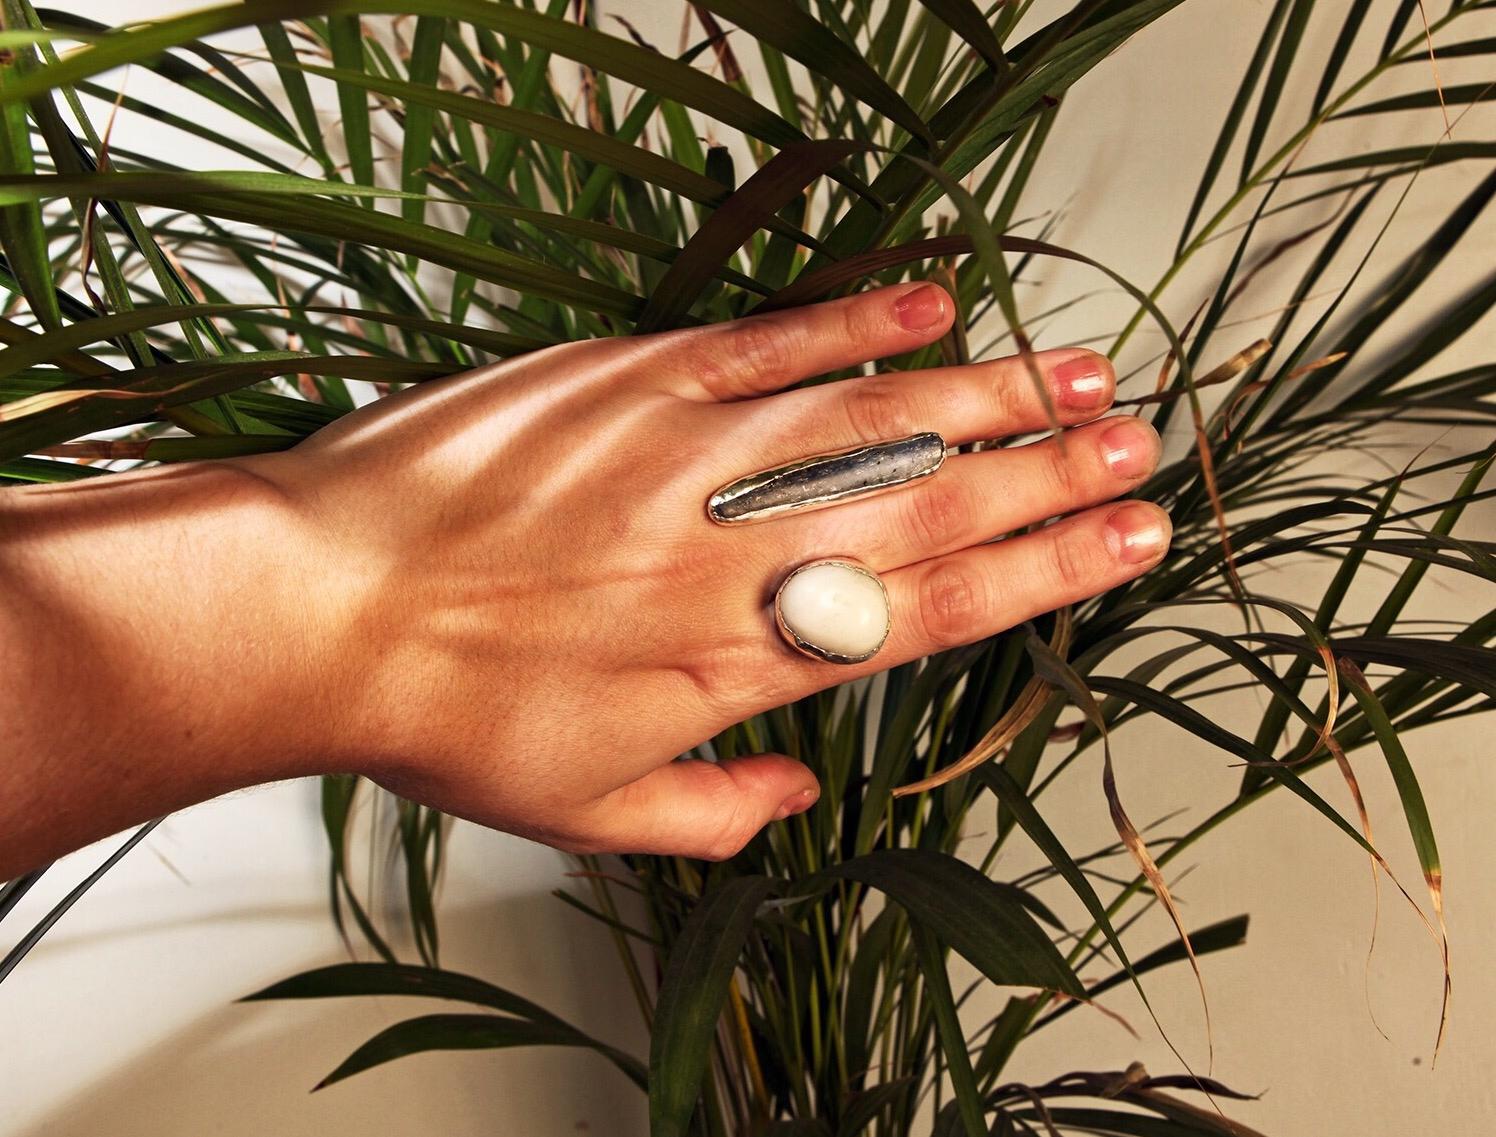 Крупное серебряное кольцо с камнями